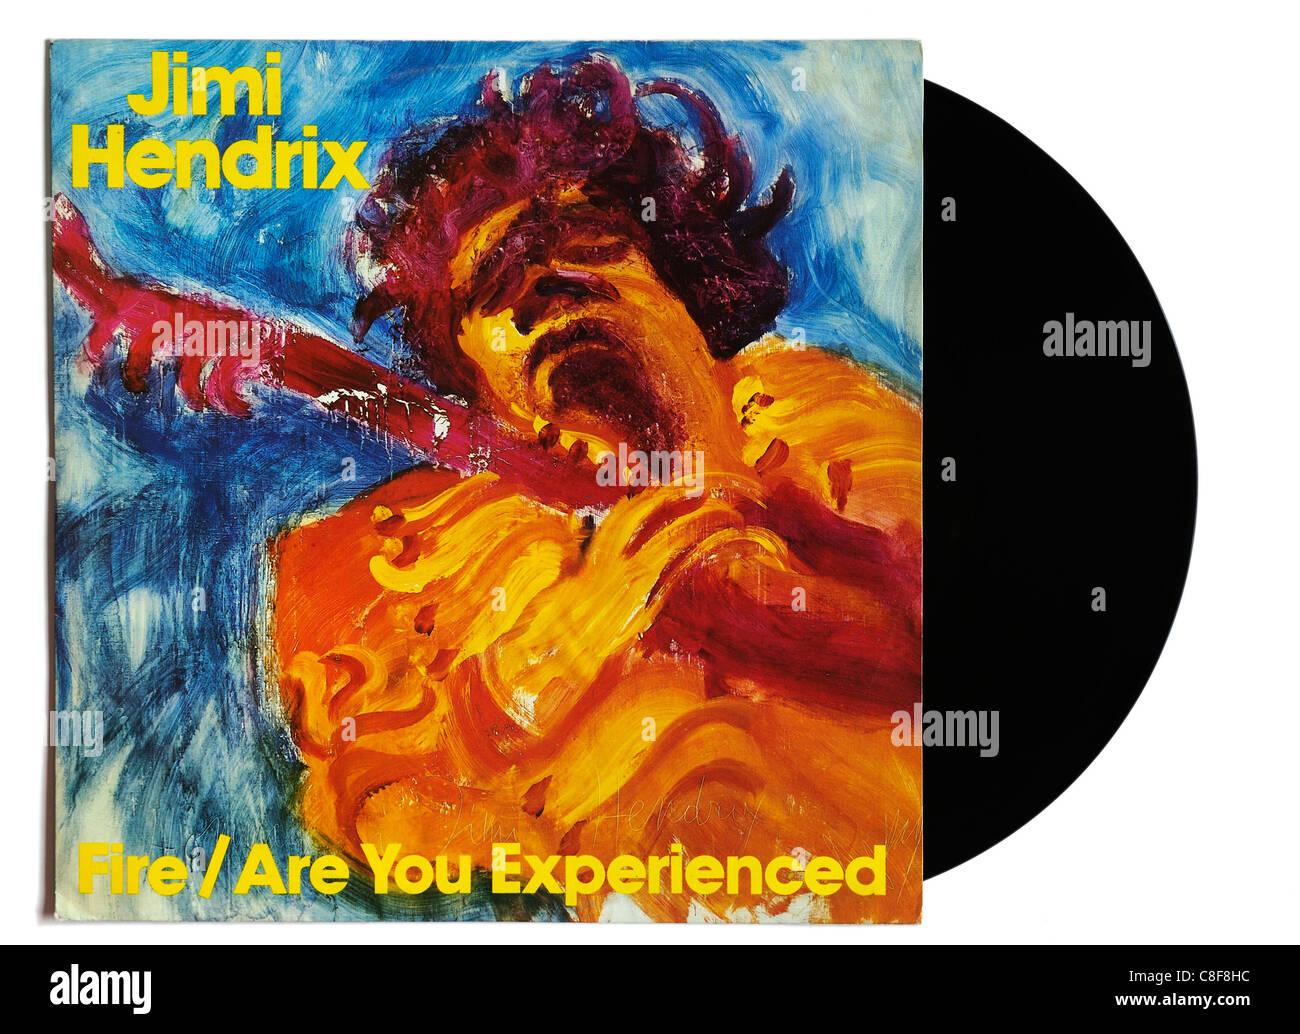 Jimi Hendrix Fire 12' single - Stock Image